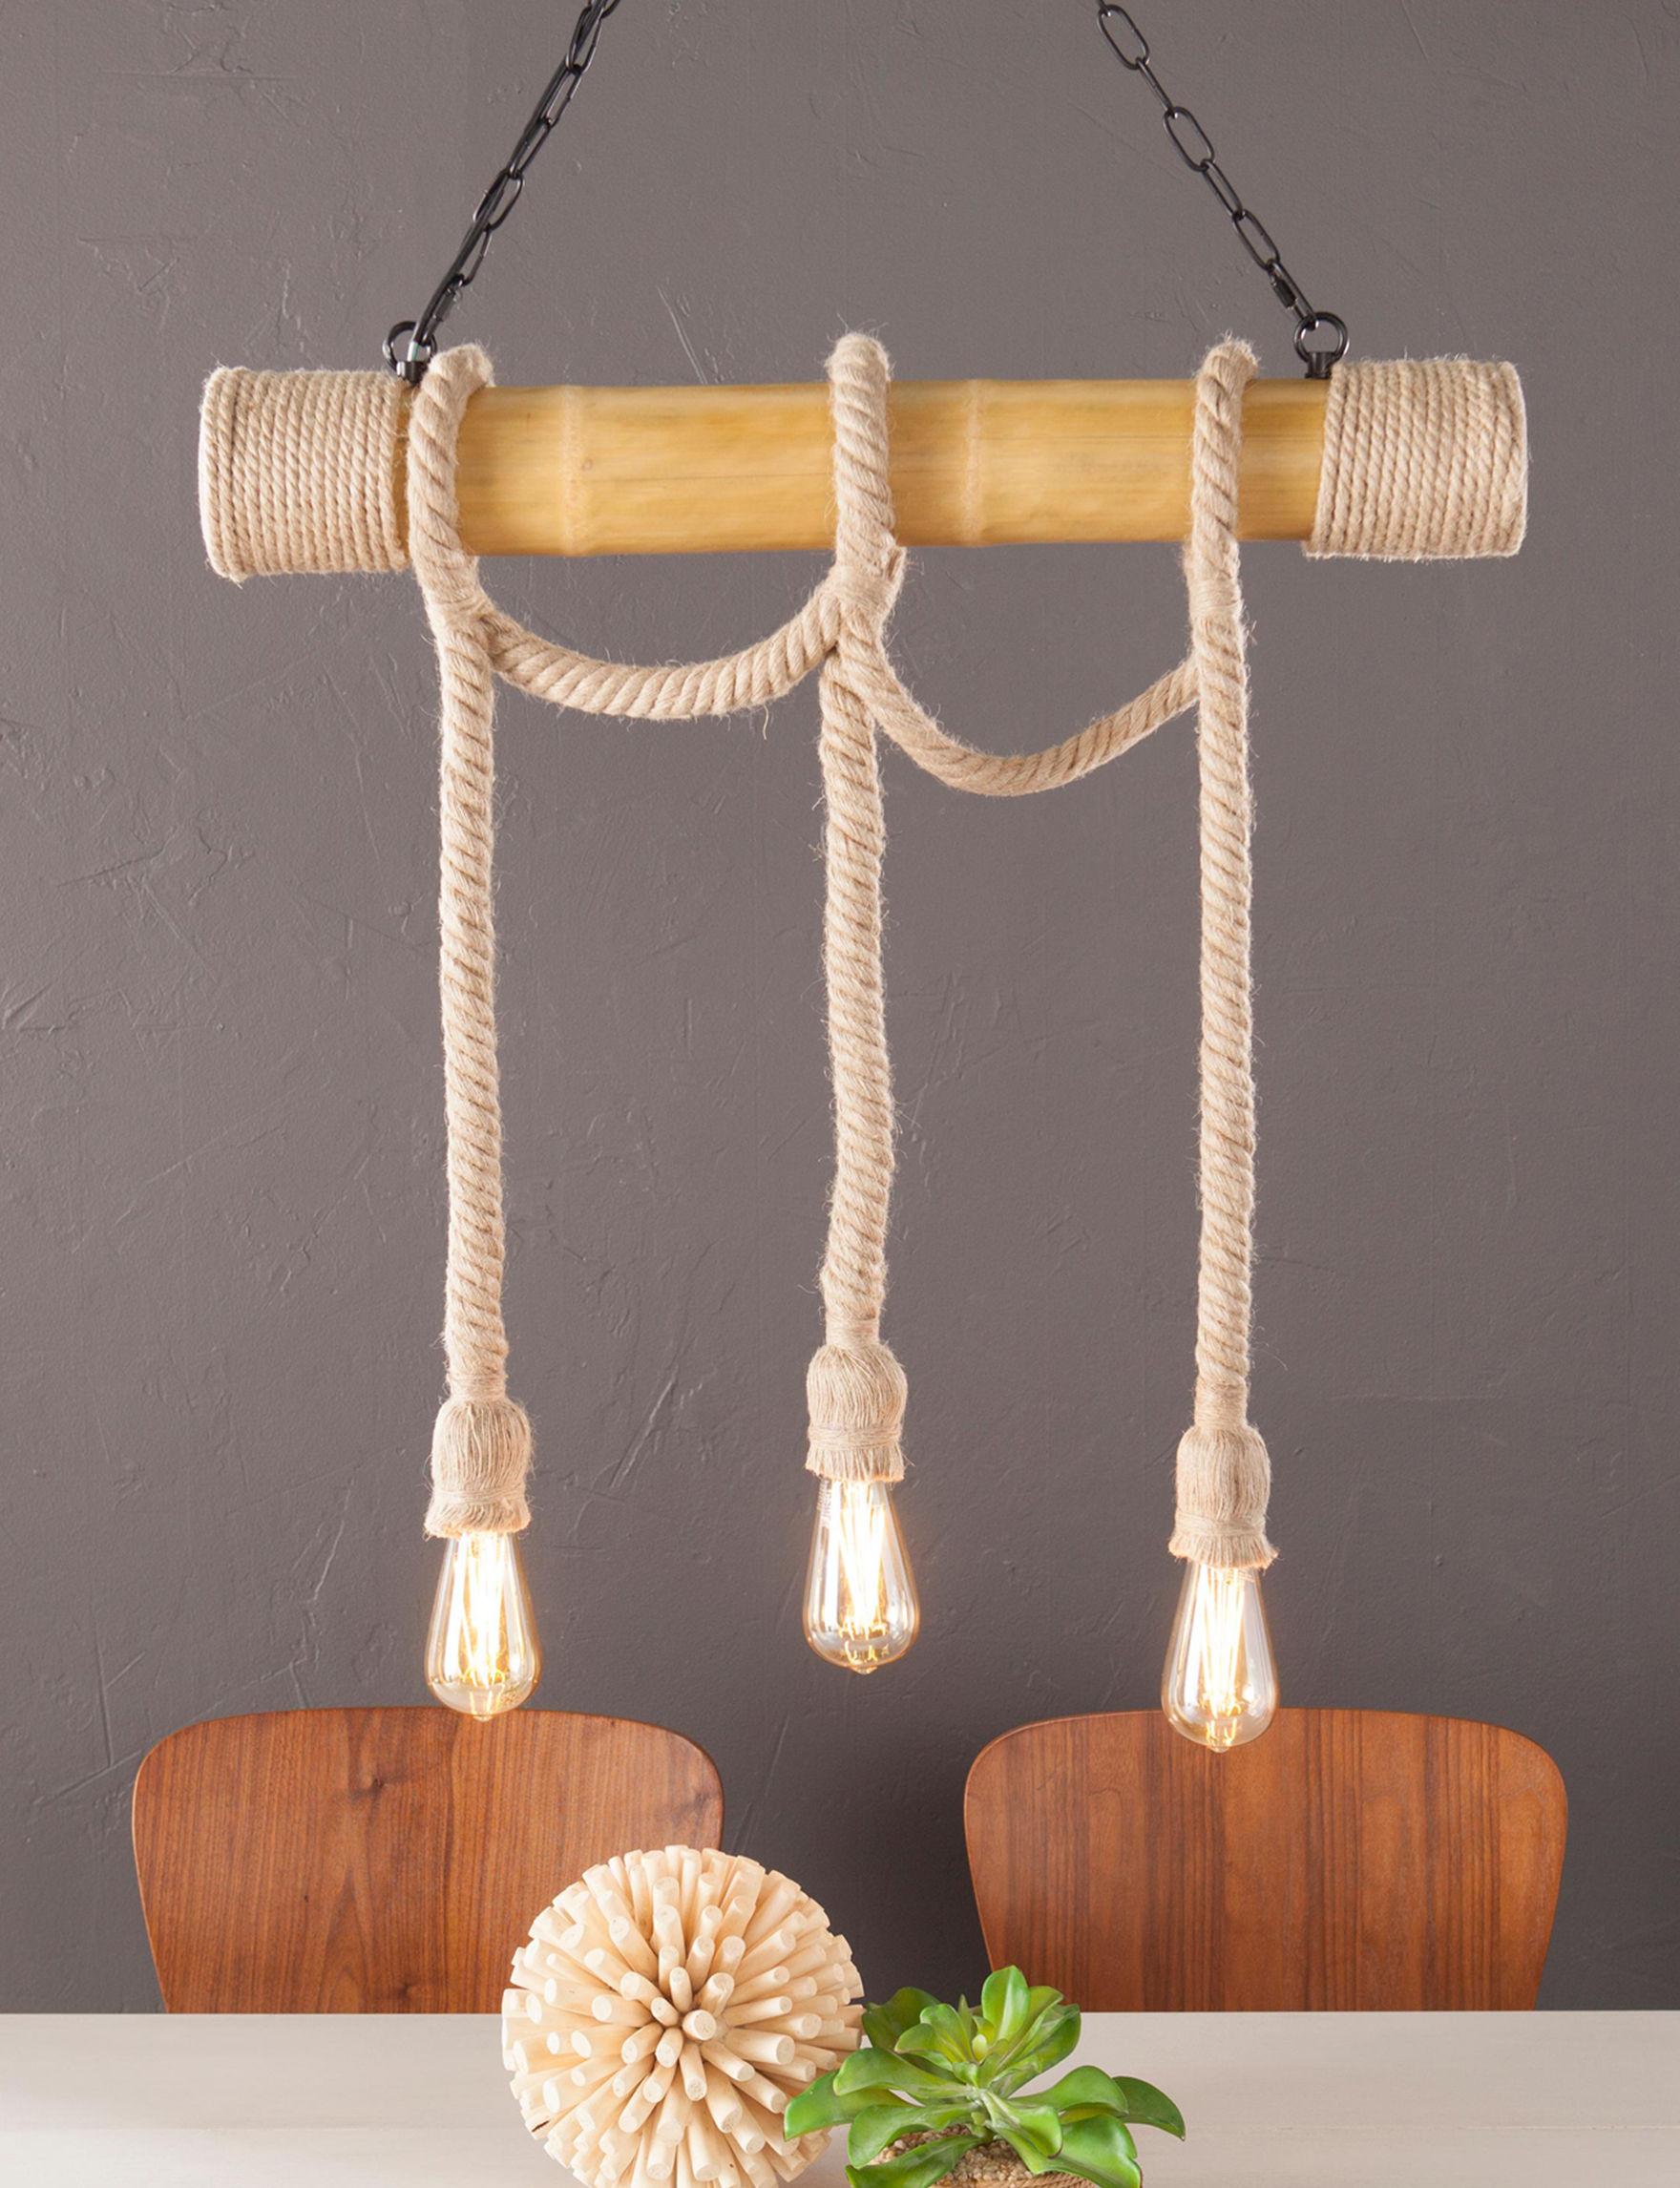 Southern Enterprises Natural Lights & Lanterns Lighting & Lamps